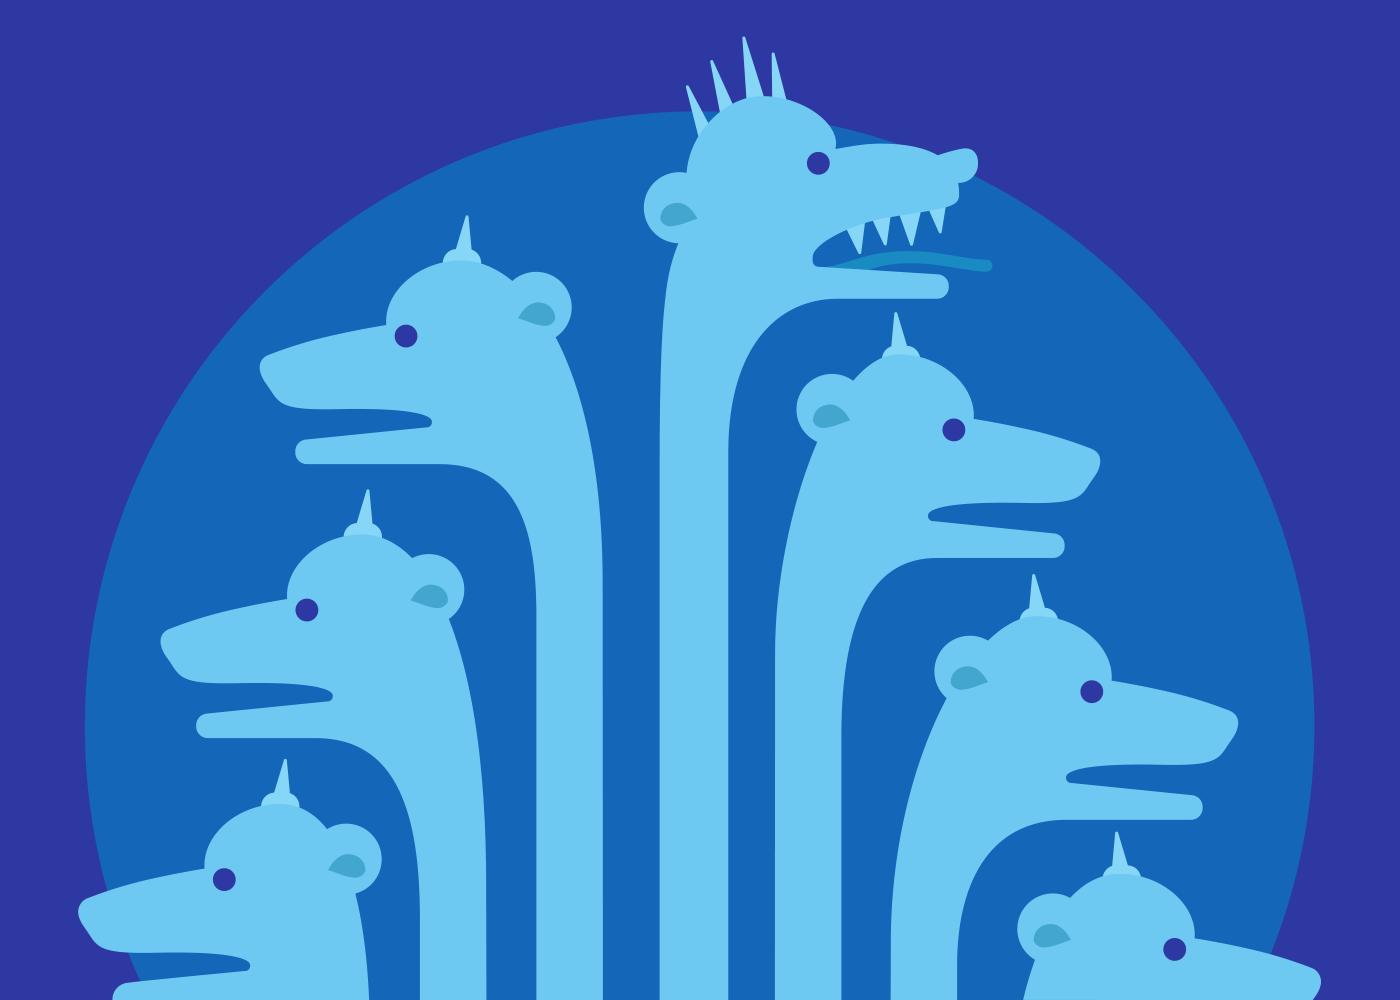 An illustration of the seven-headed beast of Revelations.